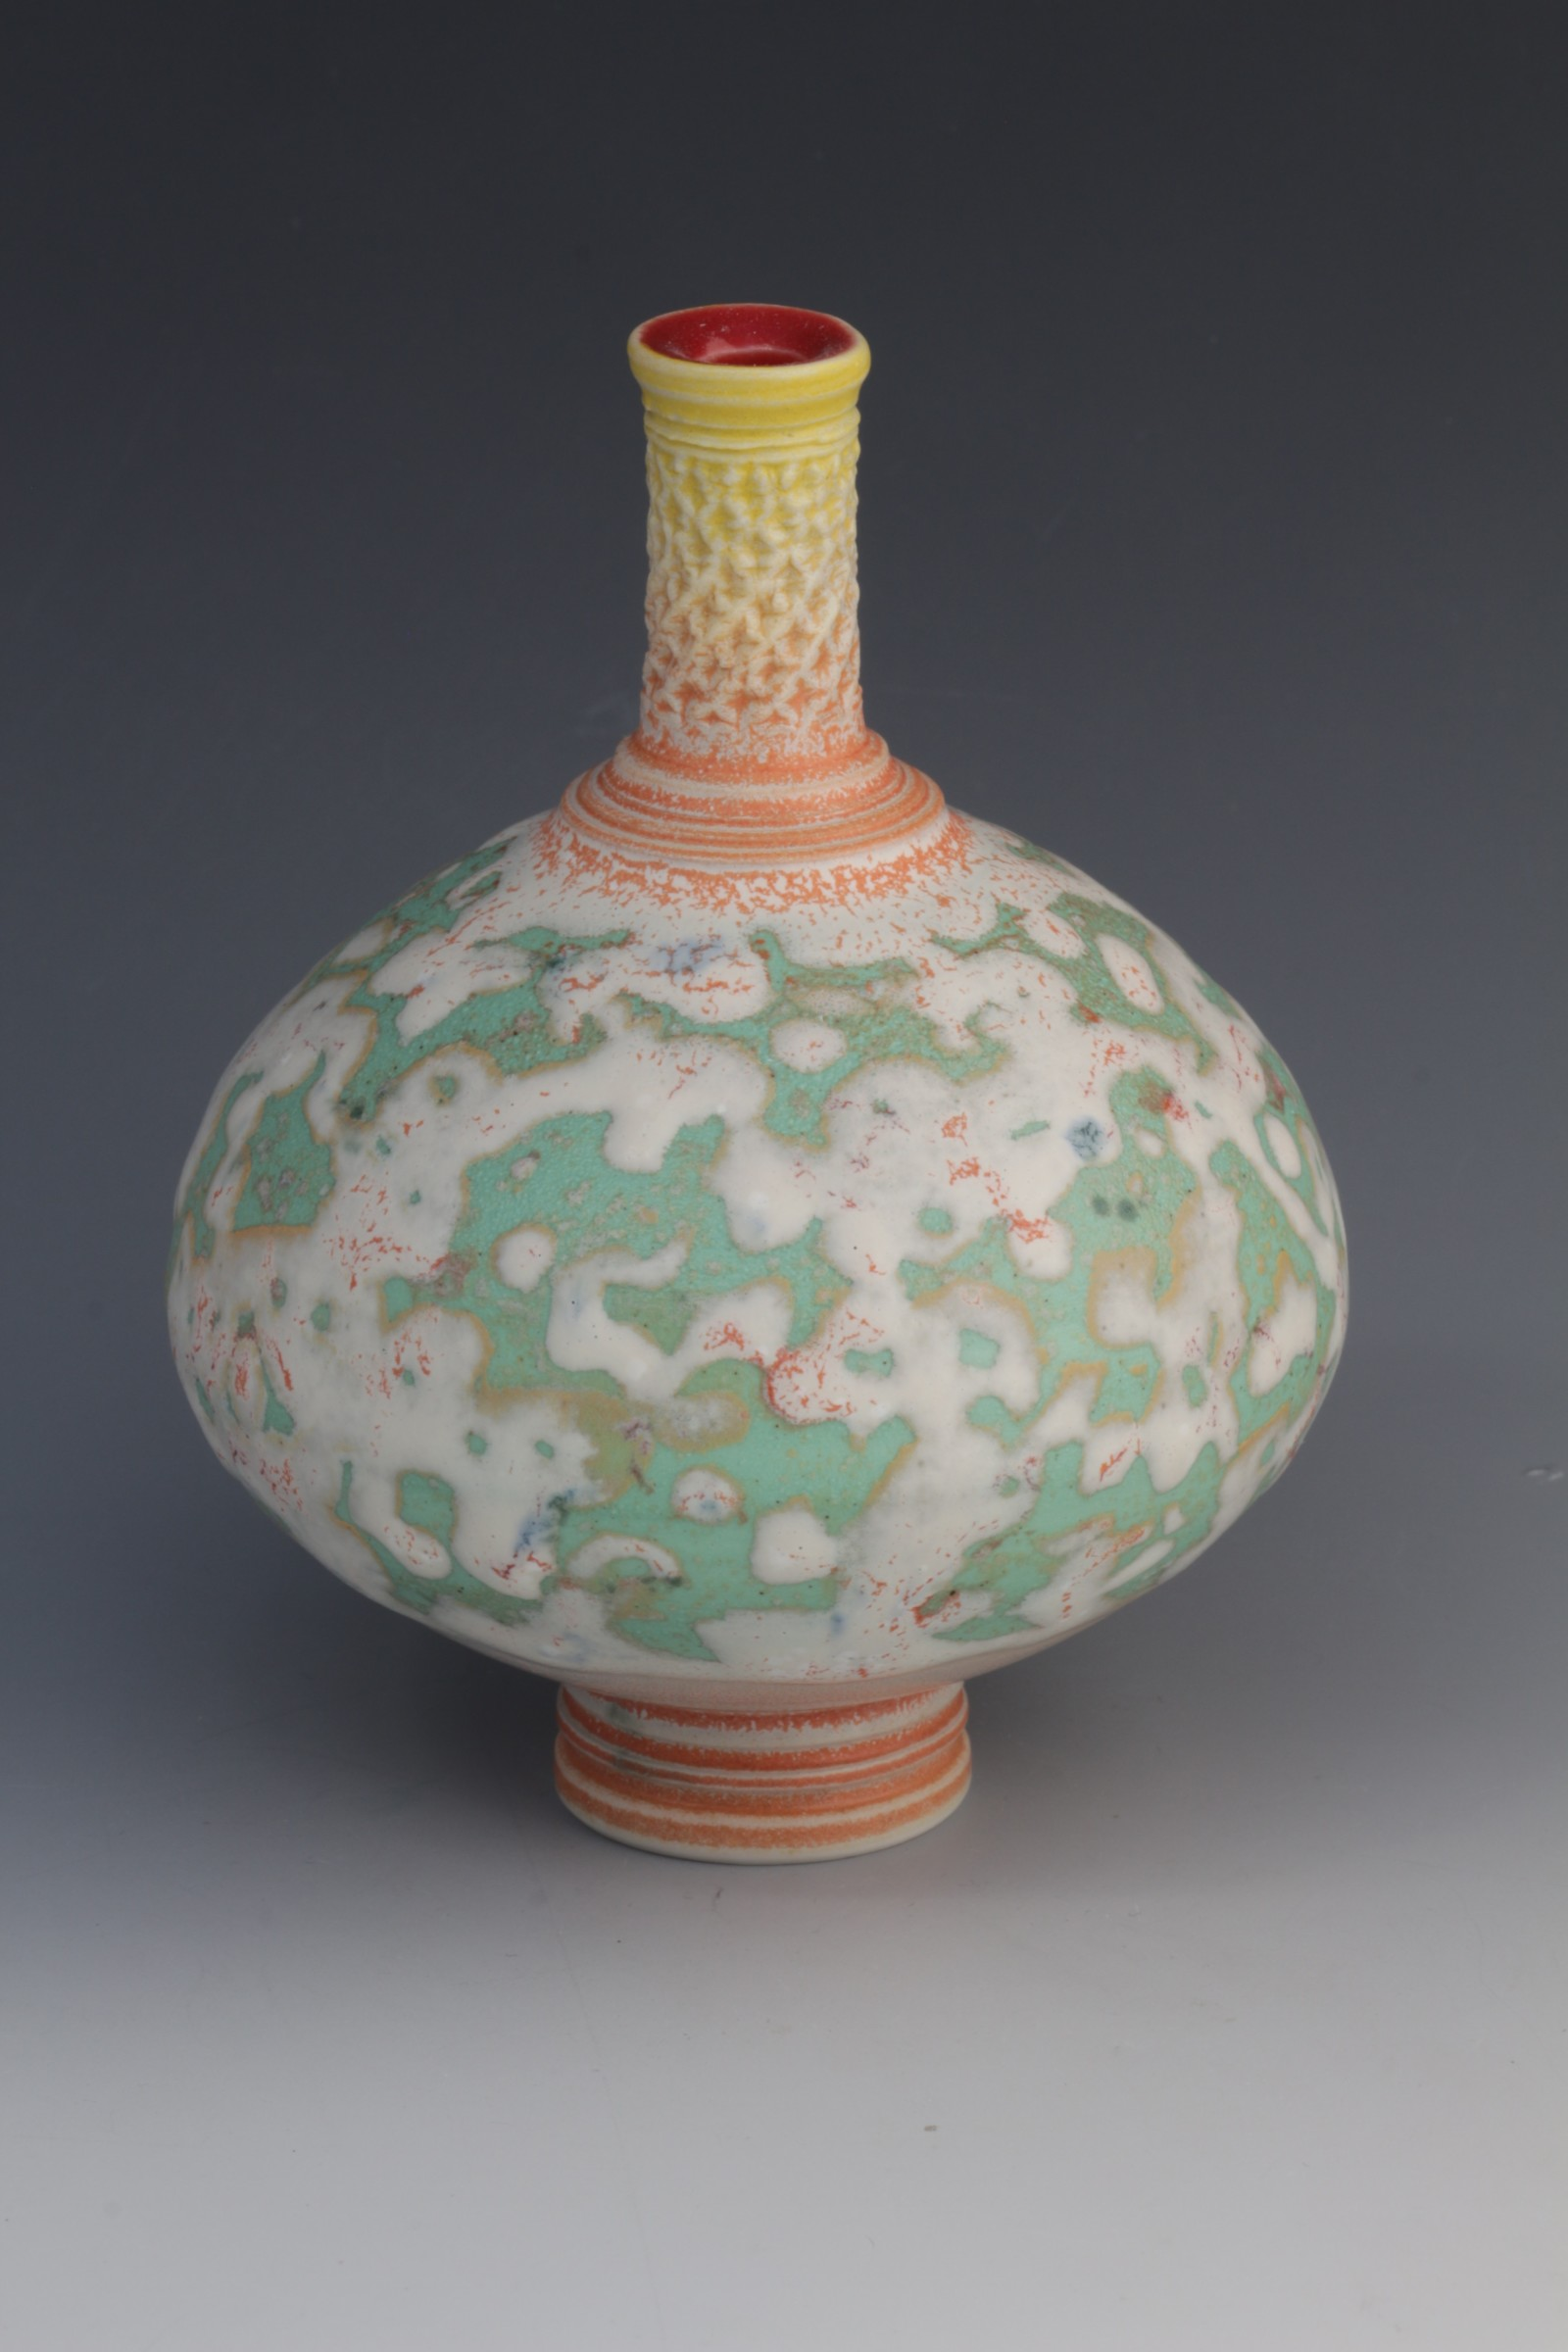 "<span class=""link fancybox-details-link""><a href=""/artists/61-geoffrey-swindell/works/6419-geoffrey-swindell-bud-vase/"">View Detail Page</a></span><div class=""artist""><strong>Geoffrey Swindell</strong></div> <div class=""title""><em>Bud Vase</em></div> <div class=""price"">£160.00</div><div class=""copyright_line"">Ownart £16 x 10 Months 0% APR</div>"